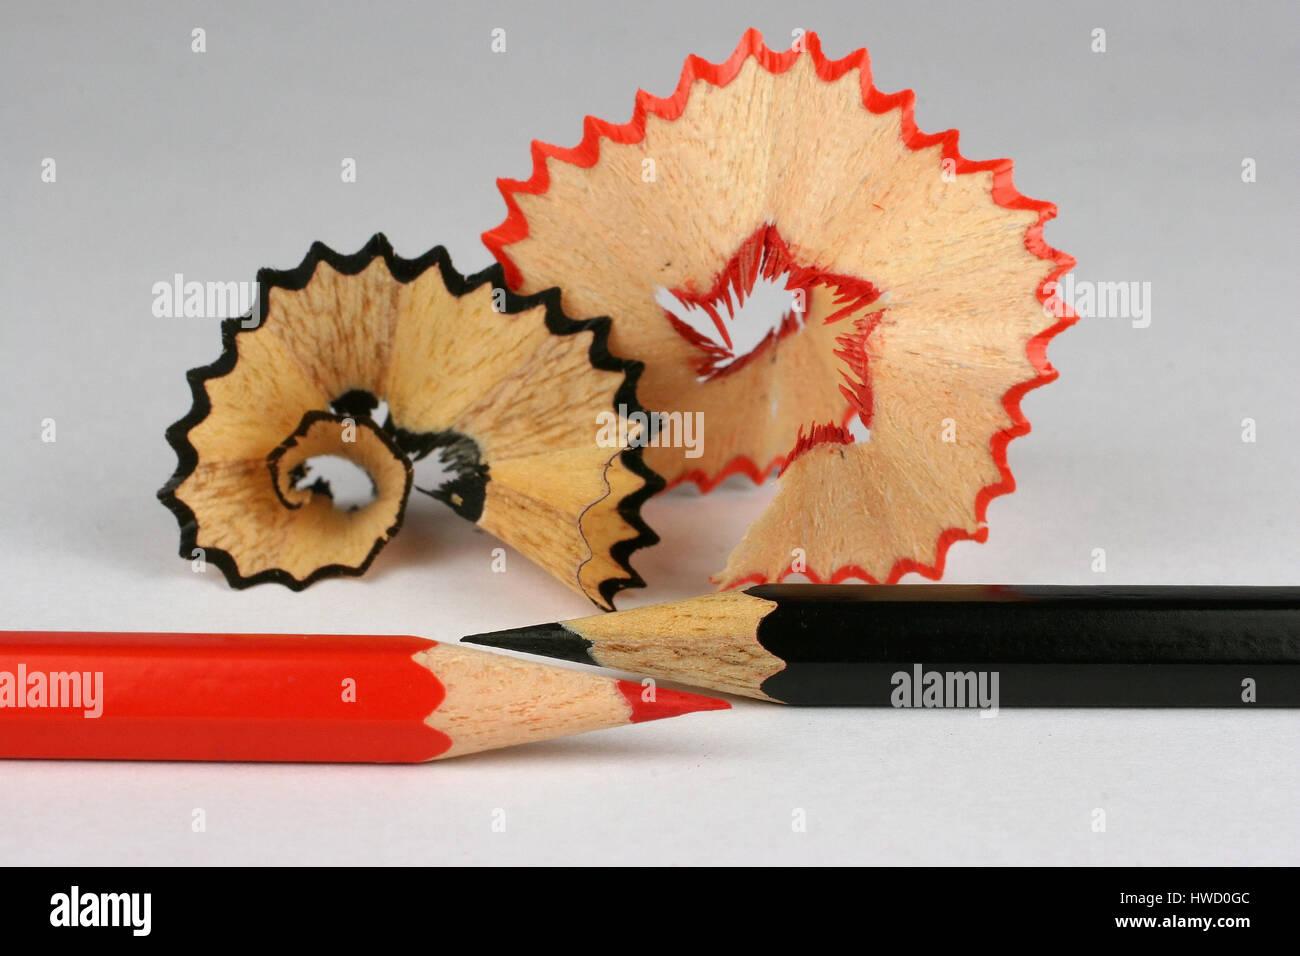 Lápices de colores y AnspitzSpa?ne, lápices de colores, lápices de colores, cosas, lápiz de Imagen De Stock